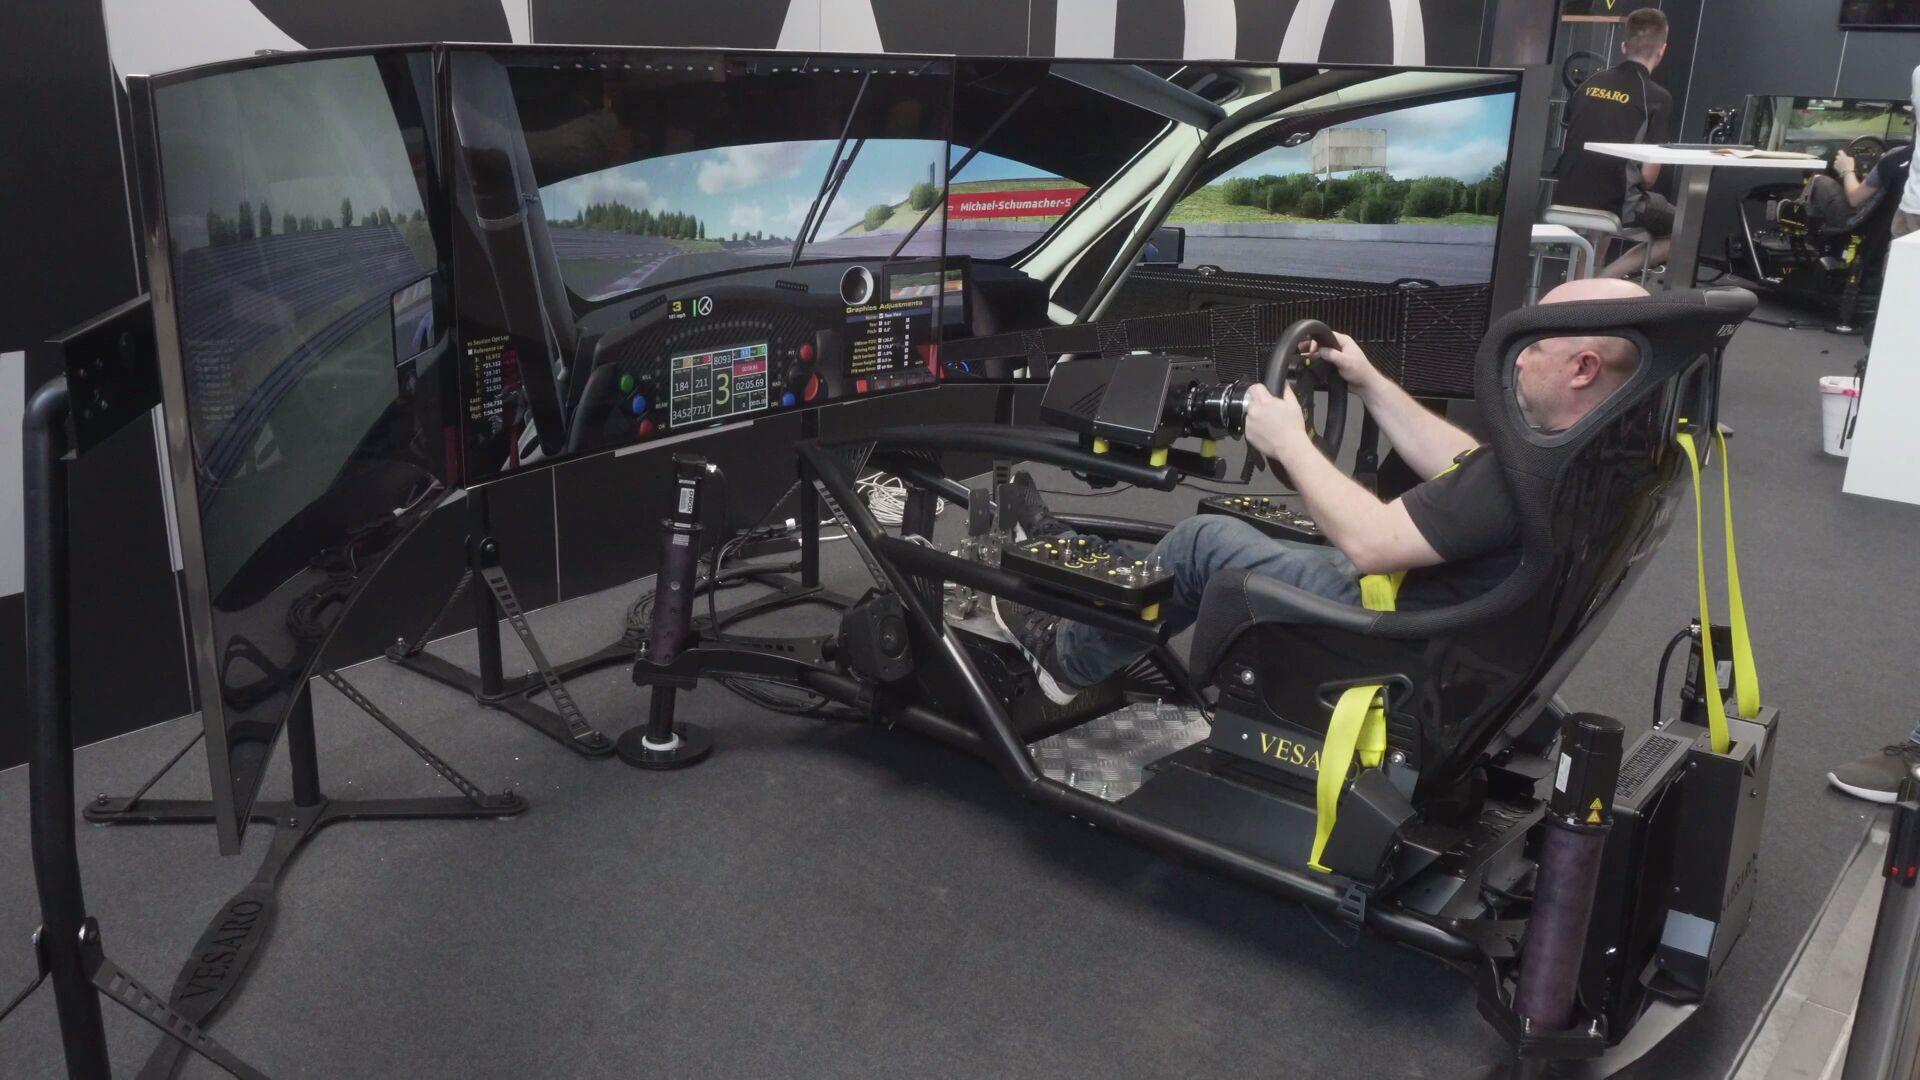 2019 SimRacing Expo 模拟赛车设备博览会